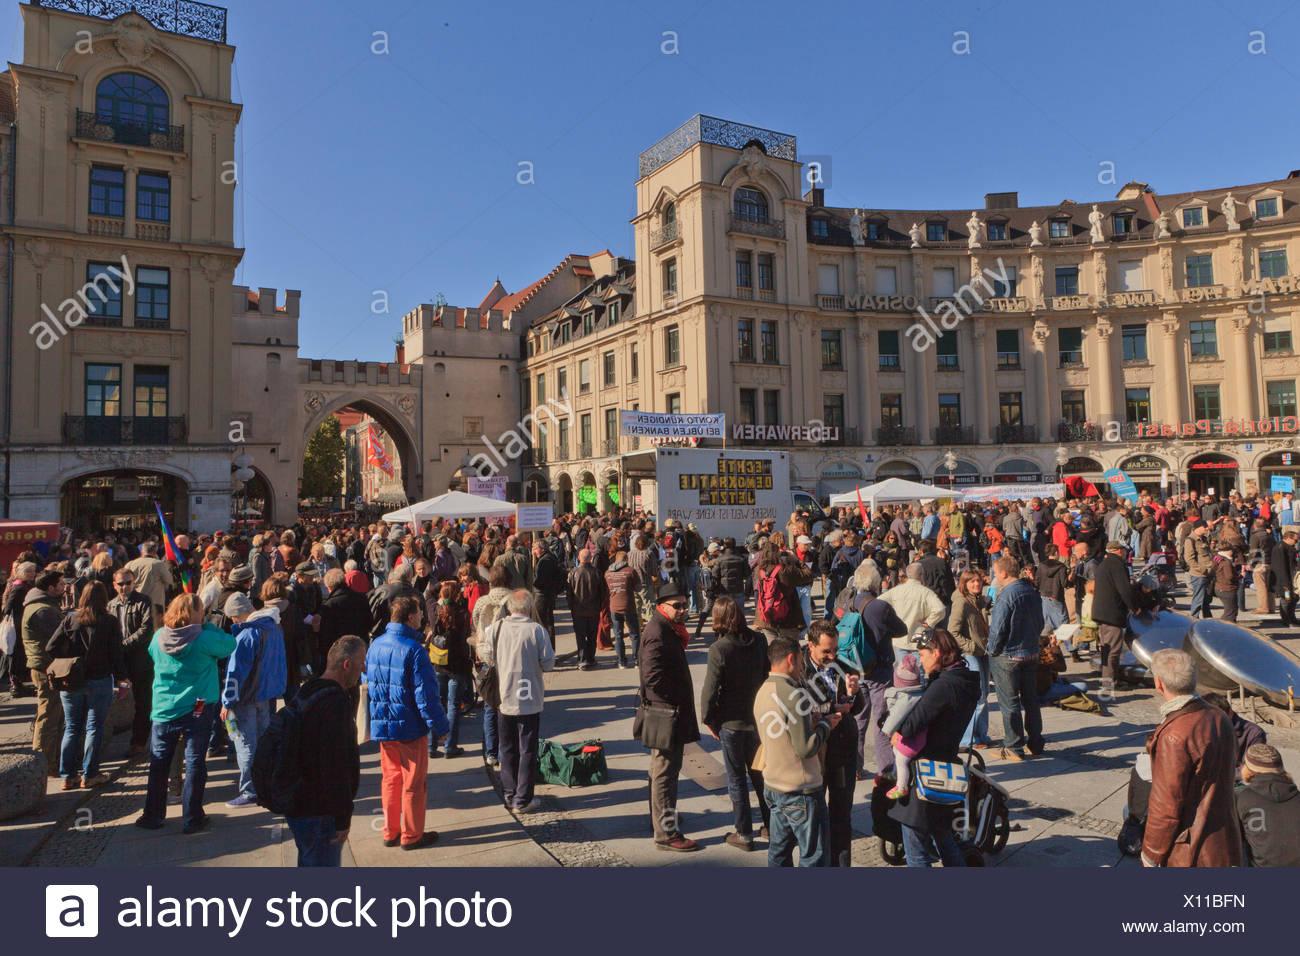 Occuyp Munich - Stock Image